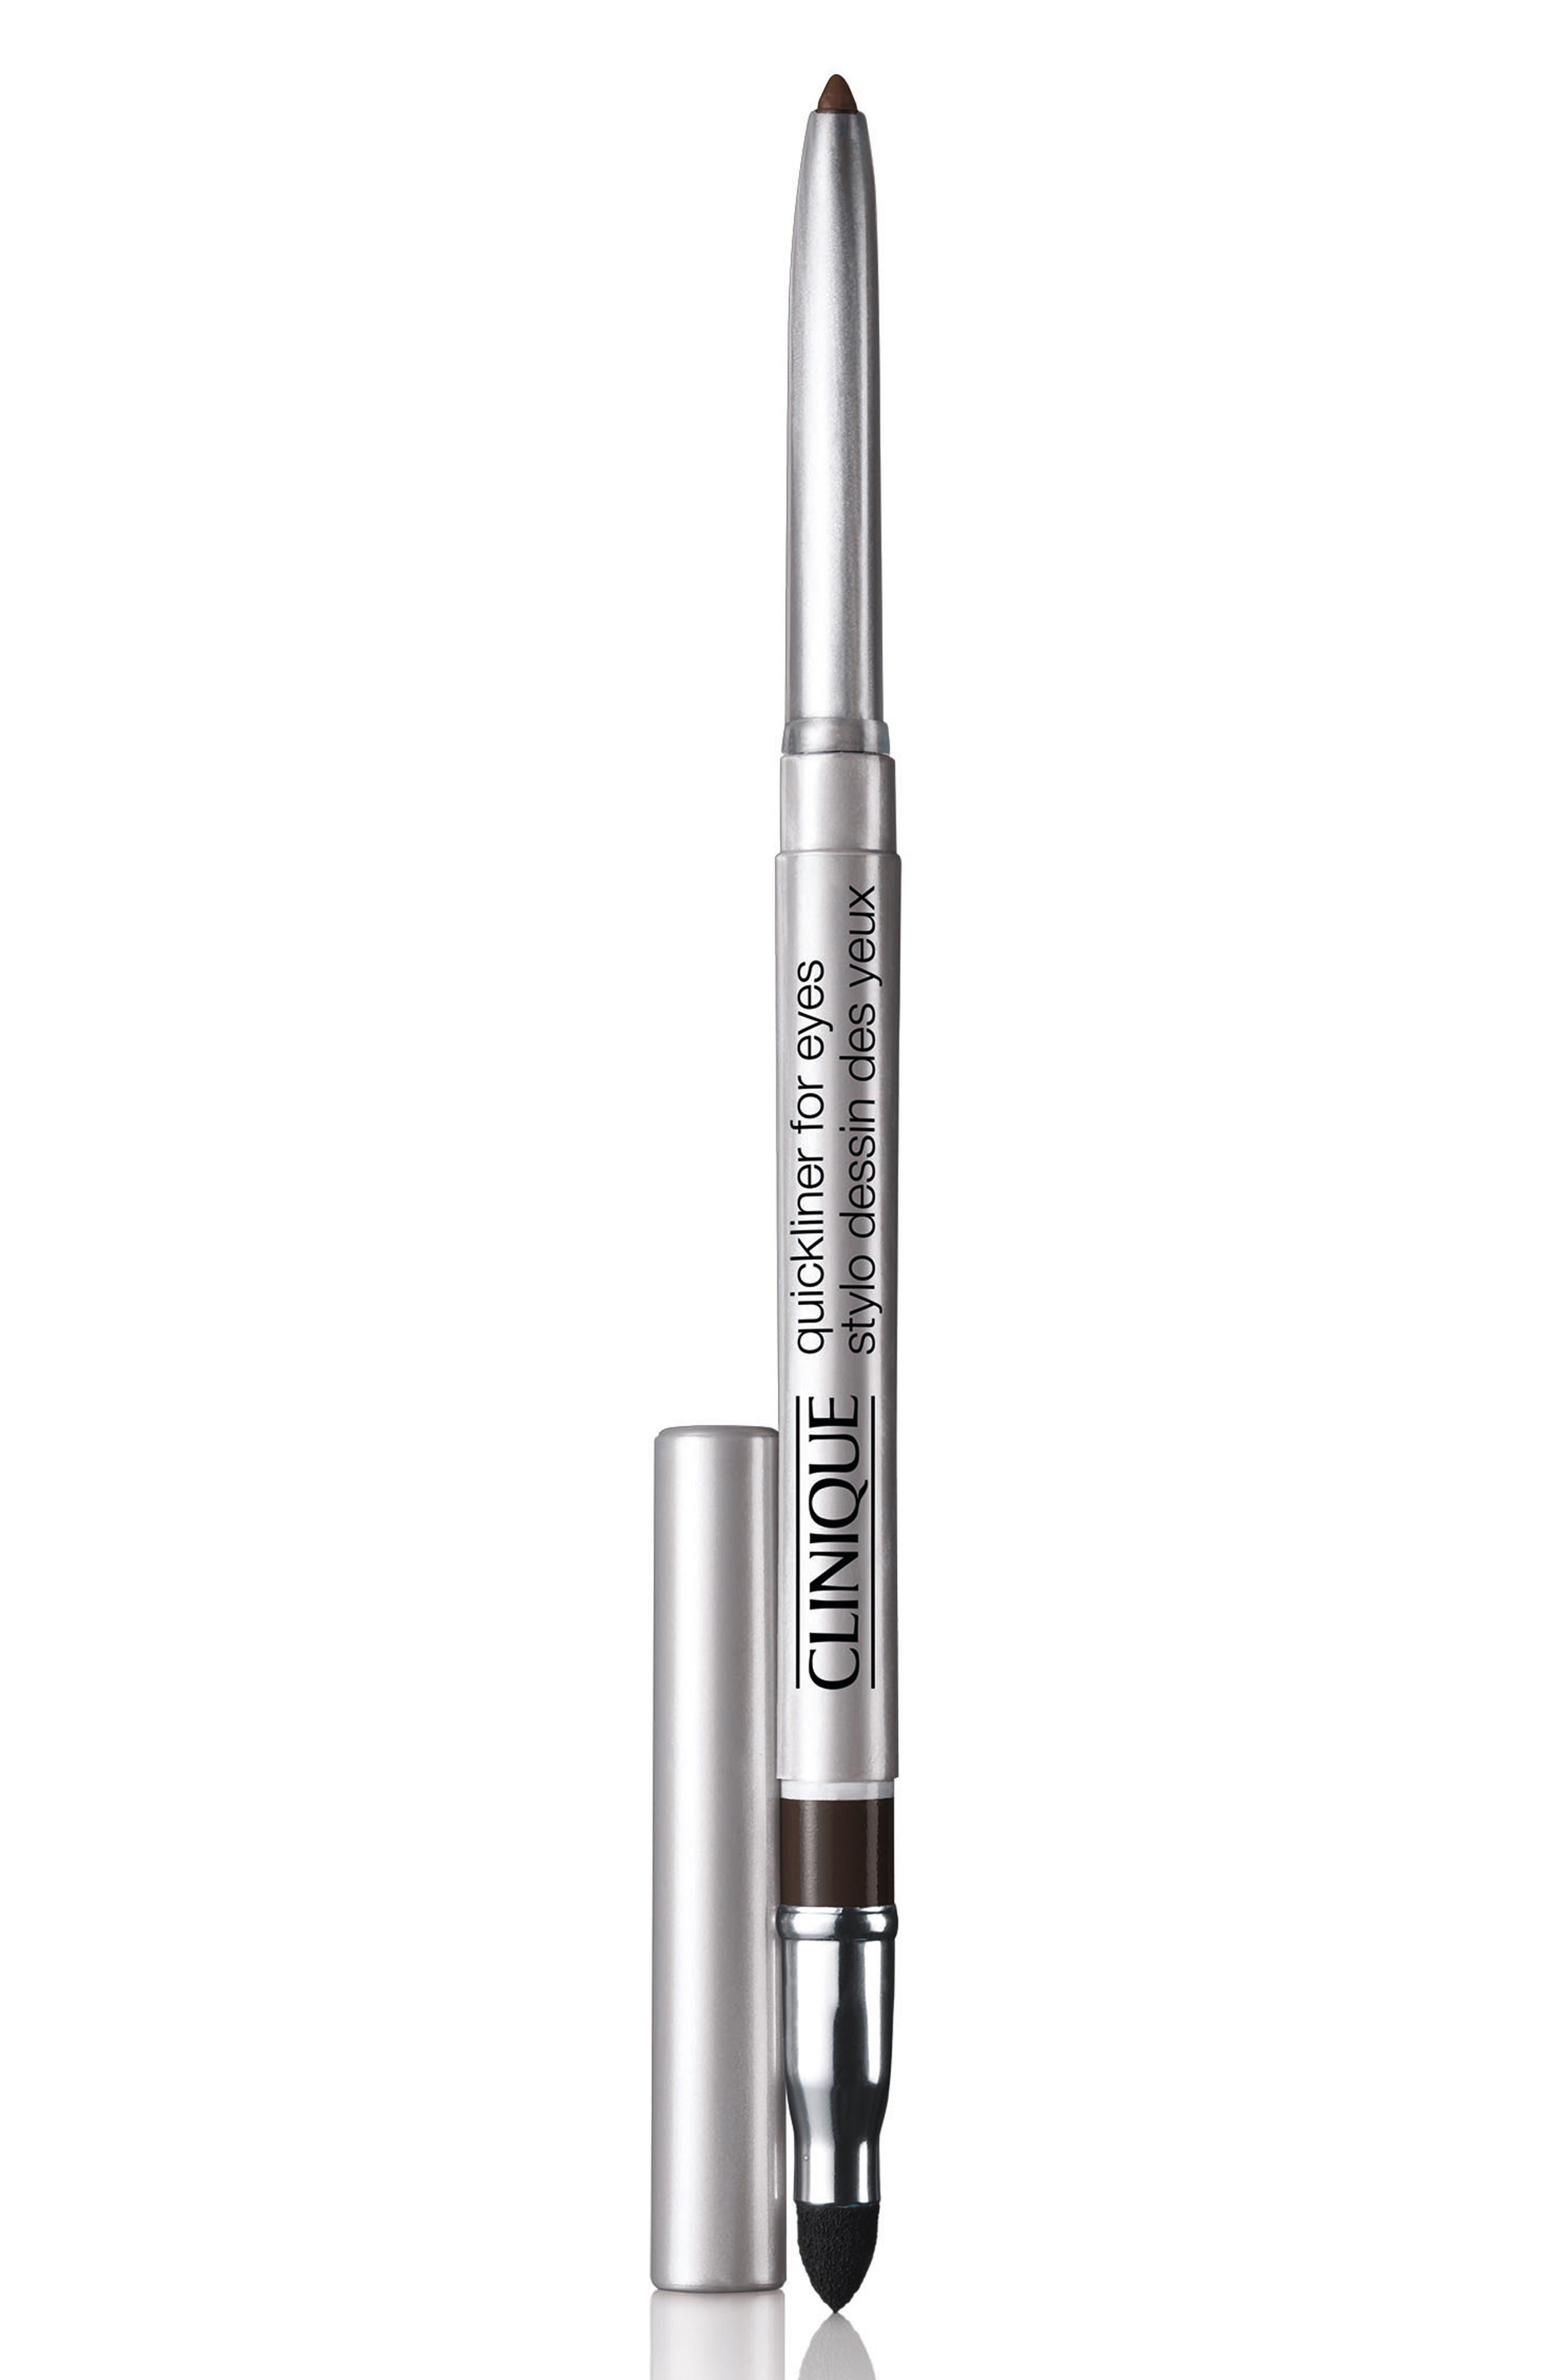 Clinique Quickliner For Eyes Eyeliner Pencil - Black/brown